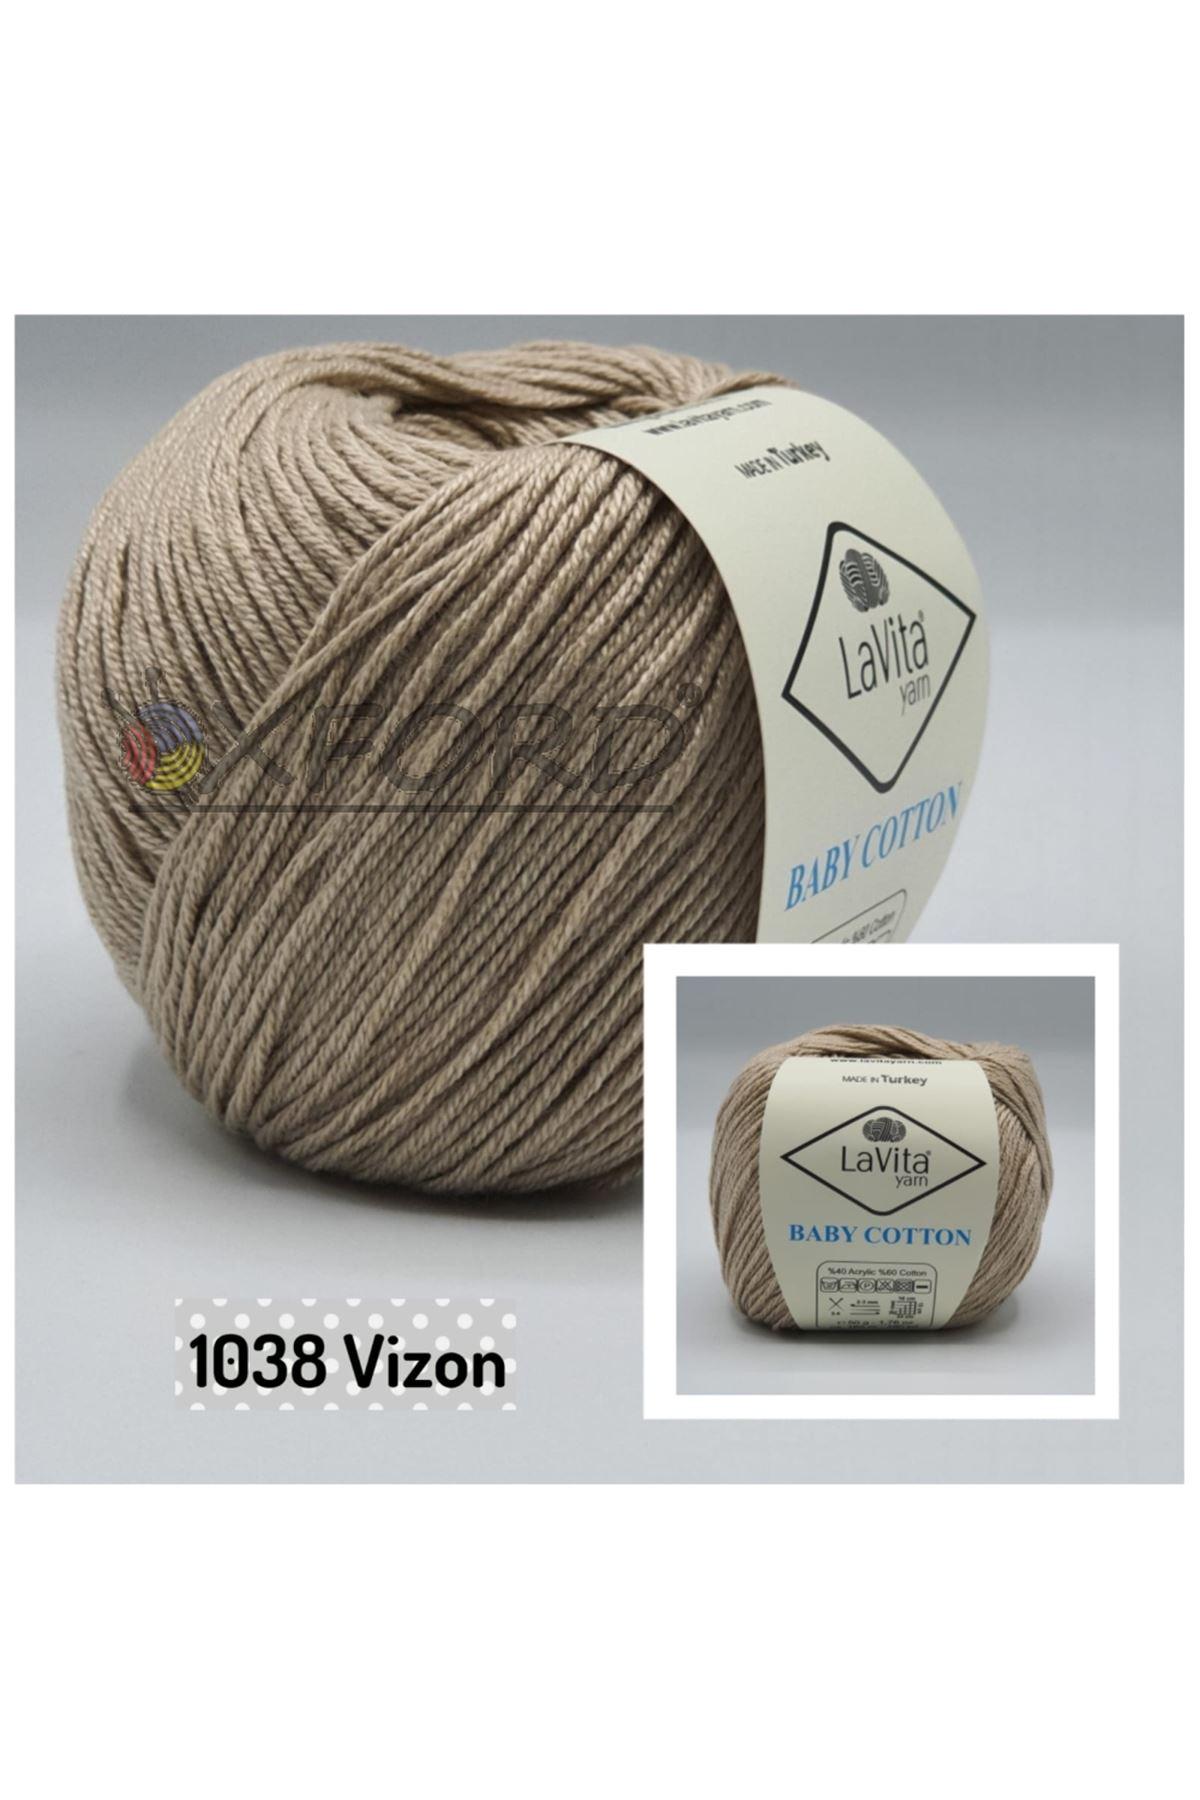 Lavita Baby Cotton 1038 Vizon